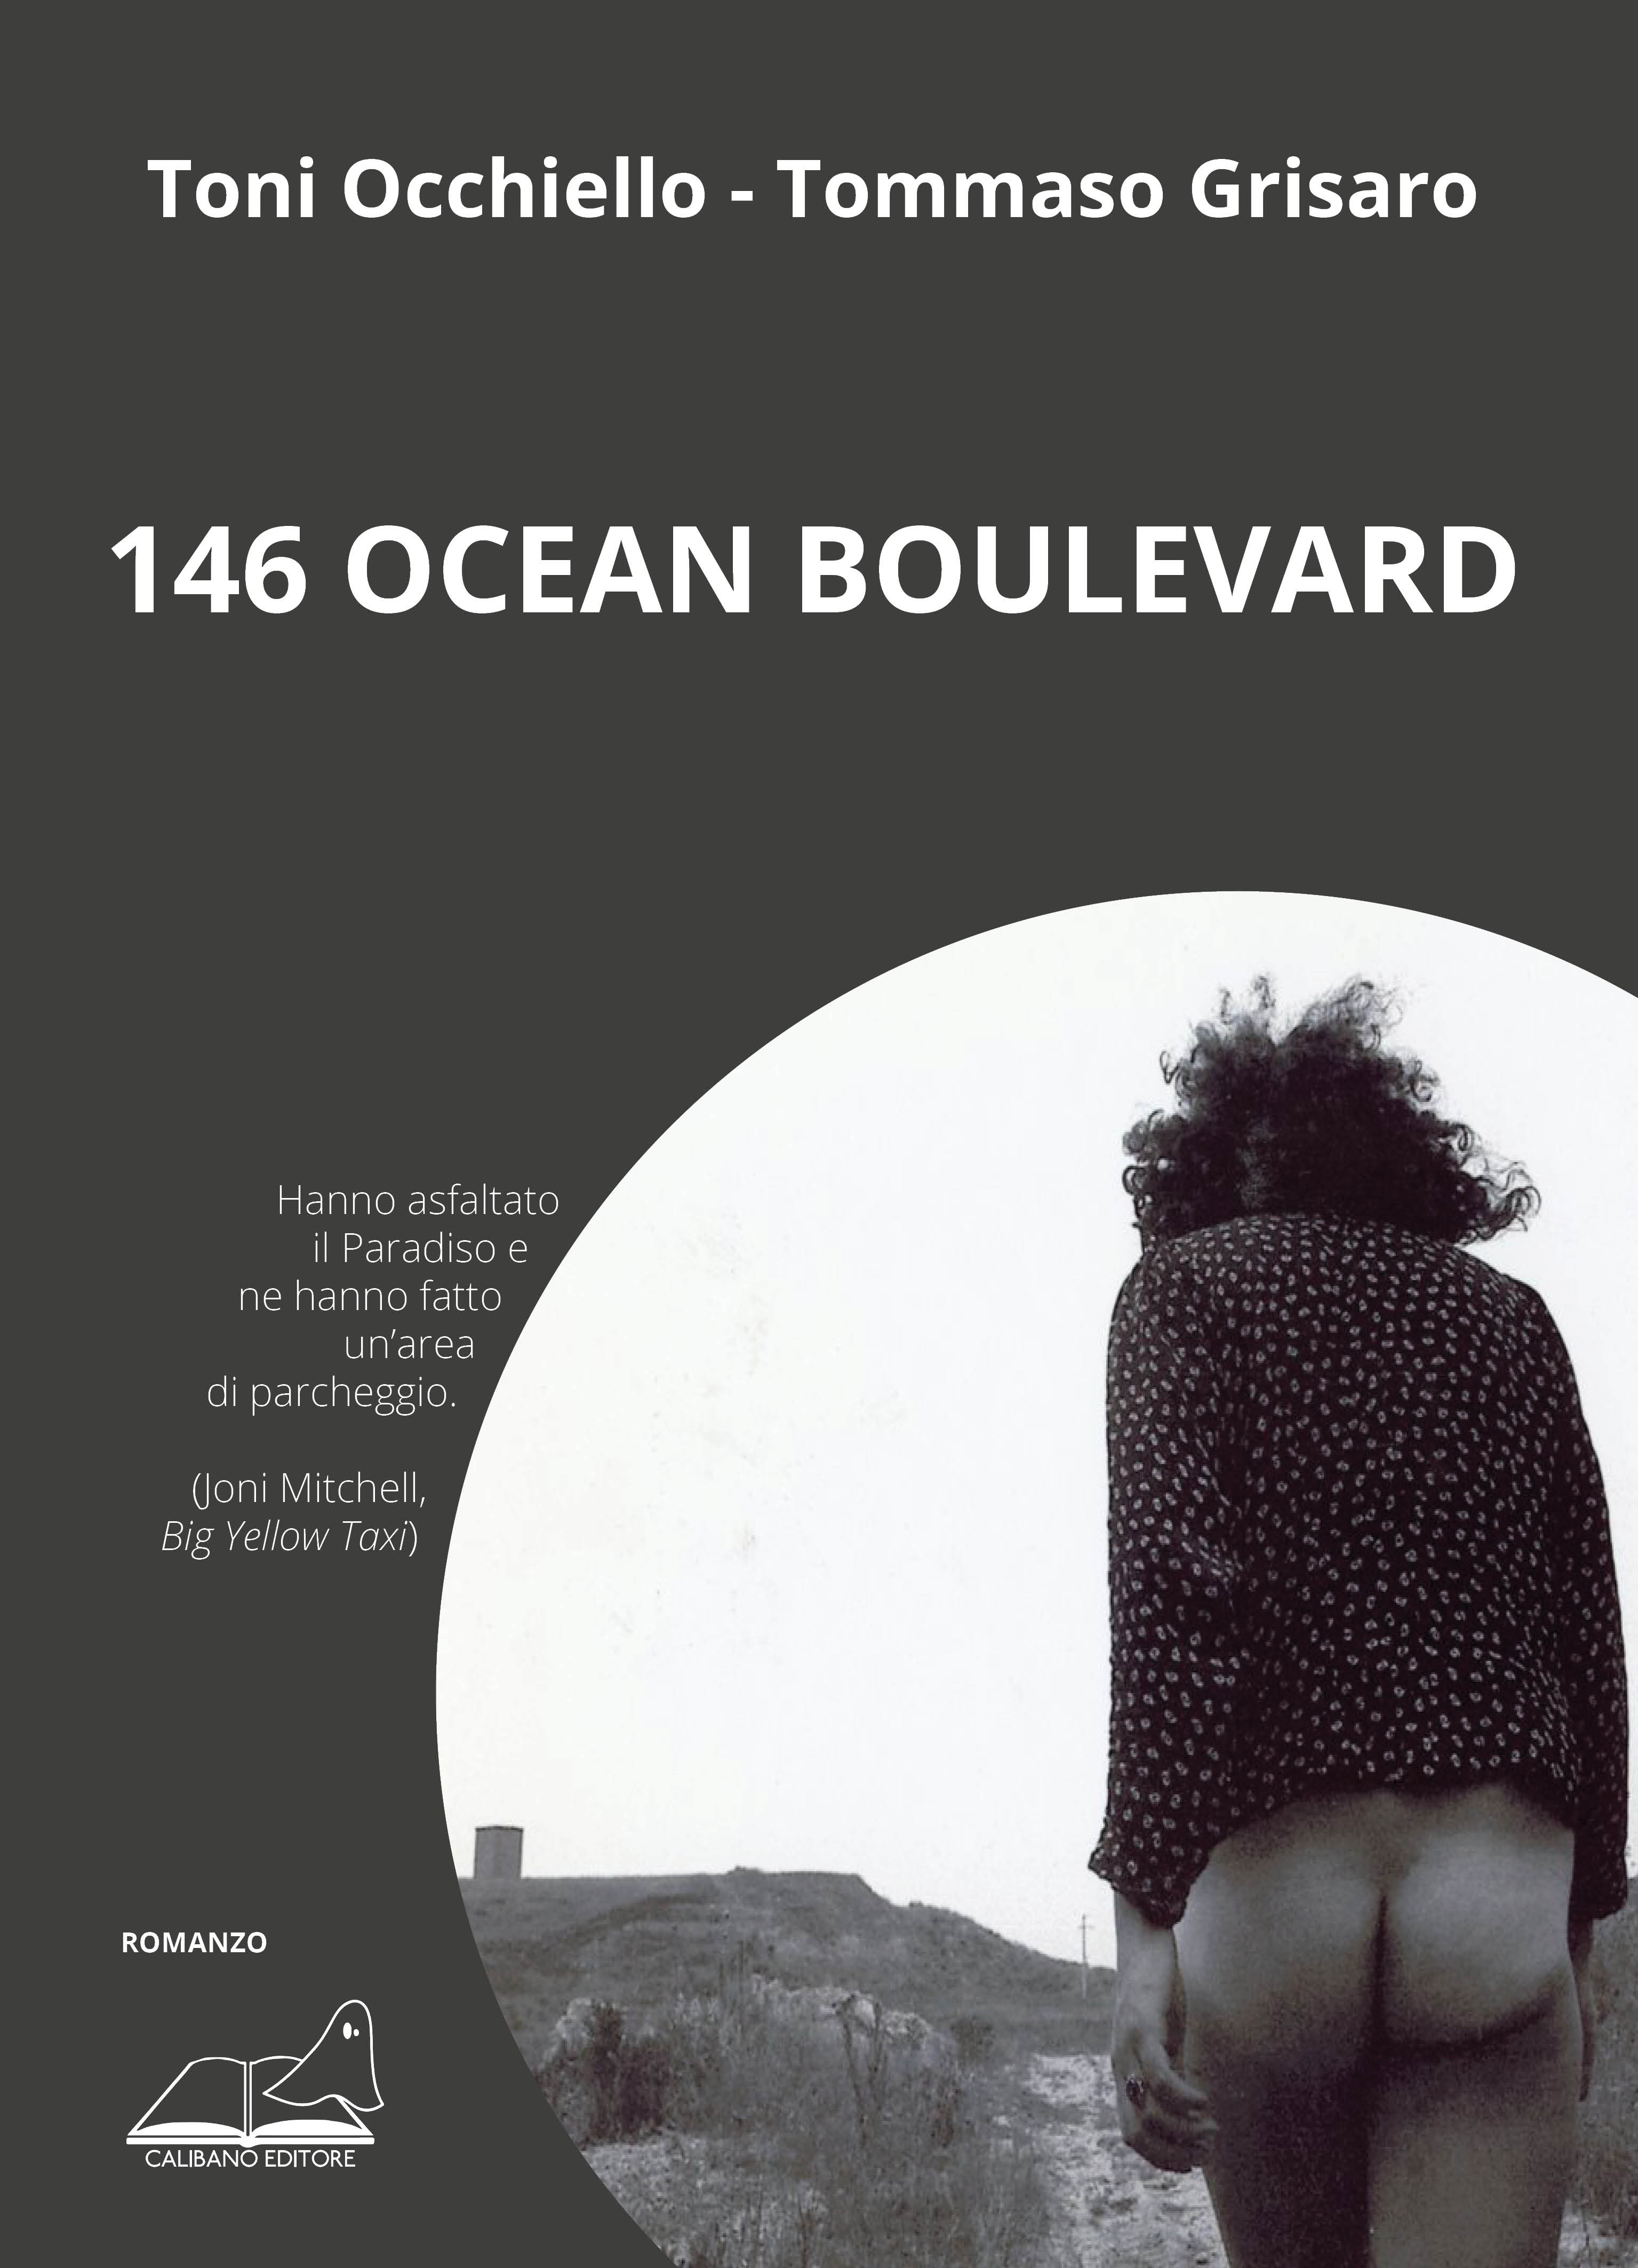 146 Ocean Boulevard-image-1%>